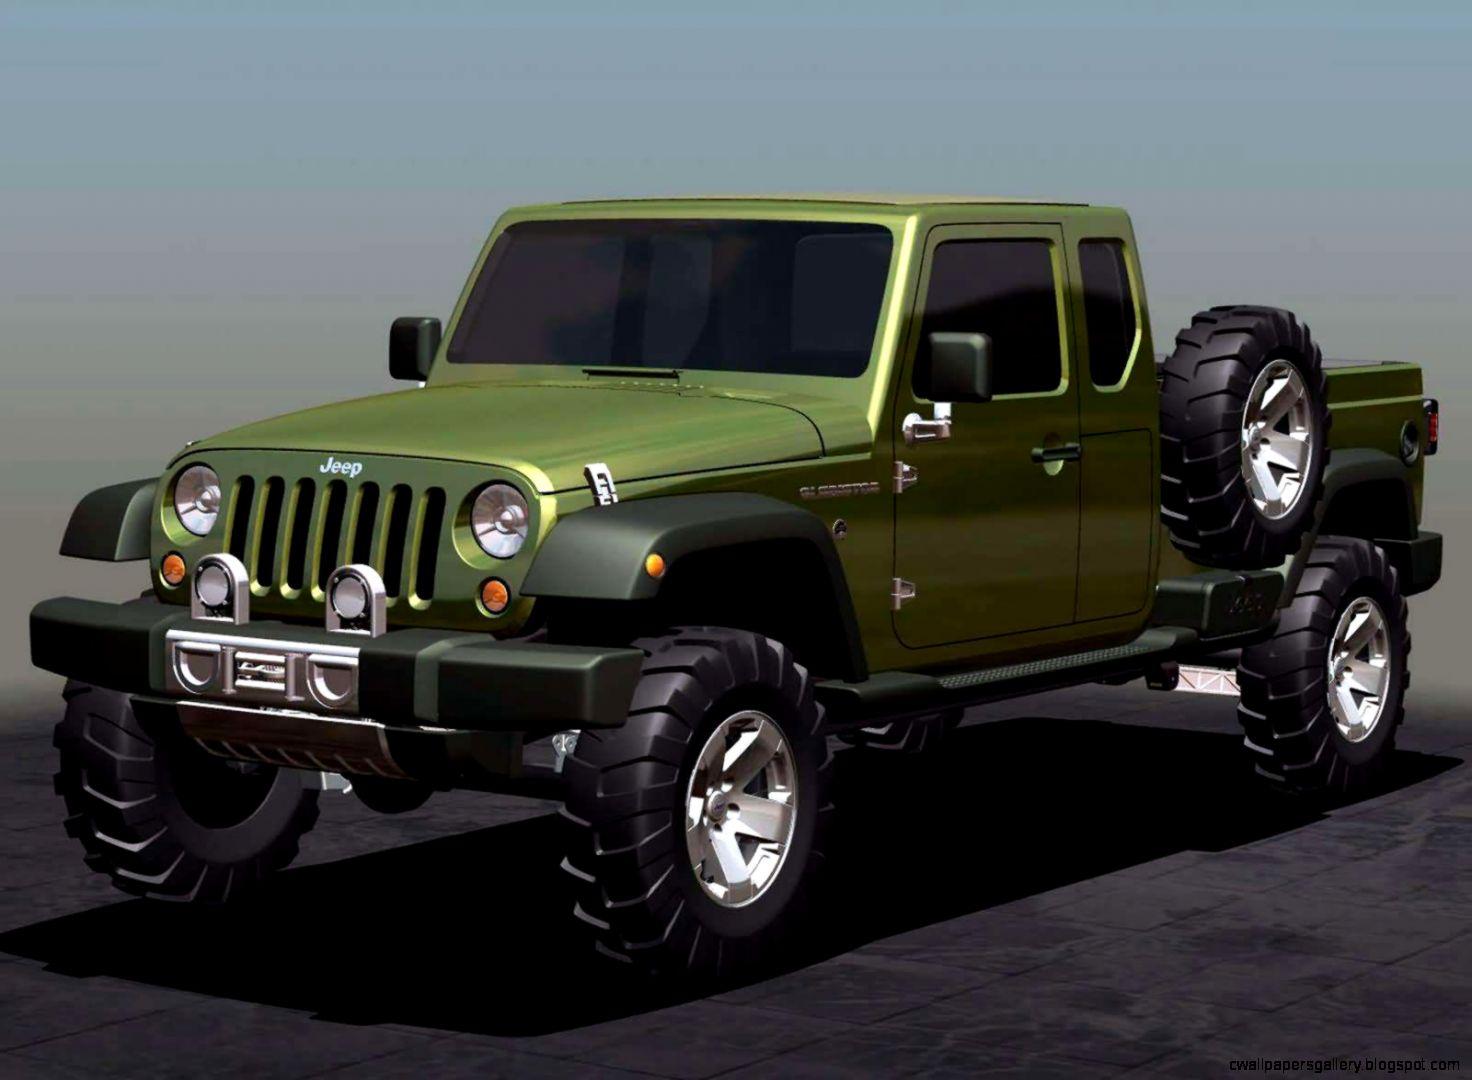 Jeep Gladiator Pickup Truck